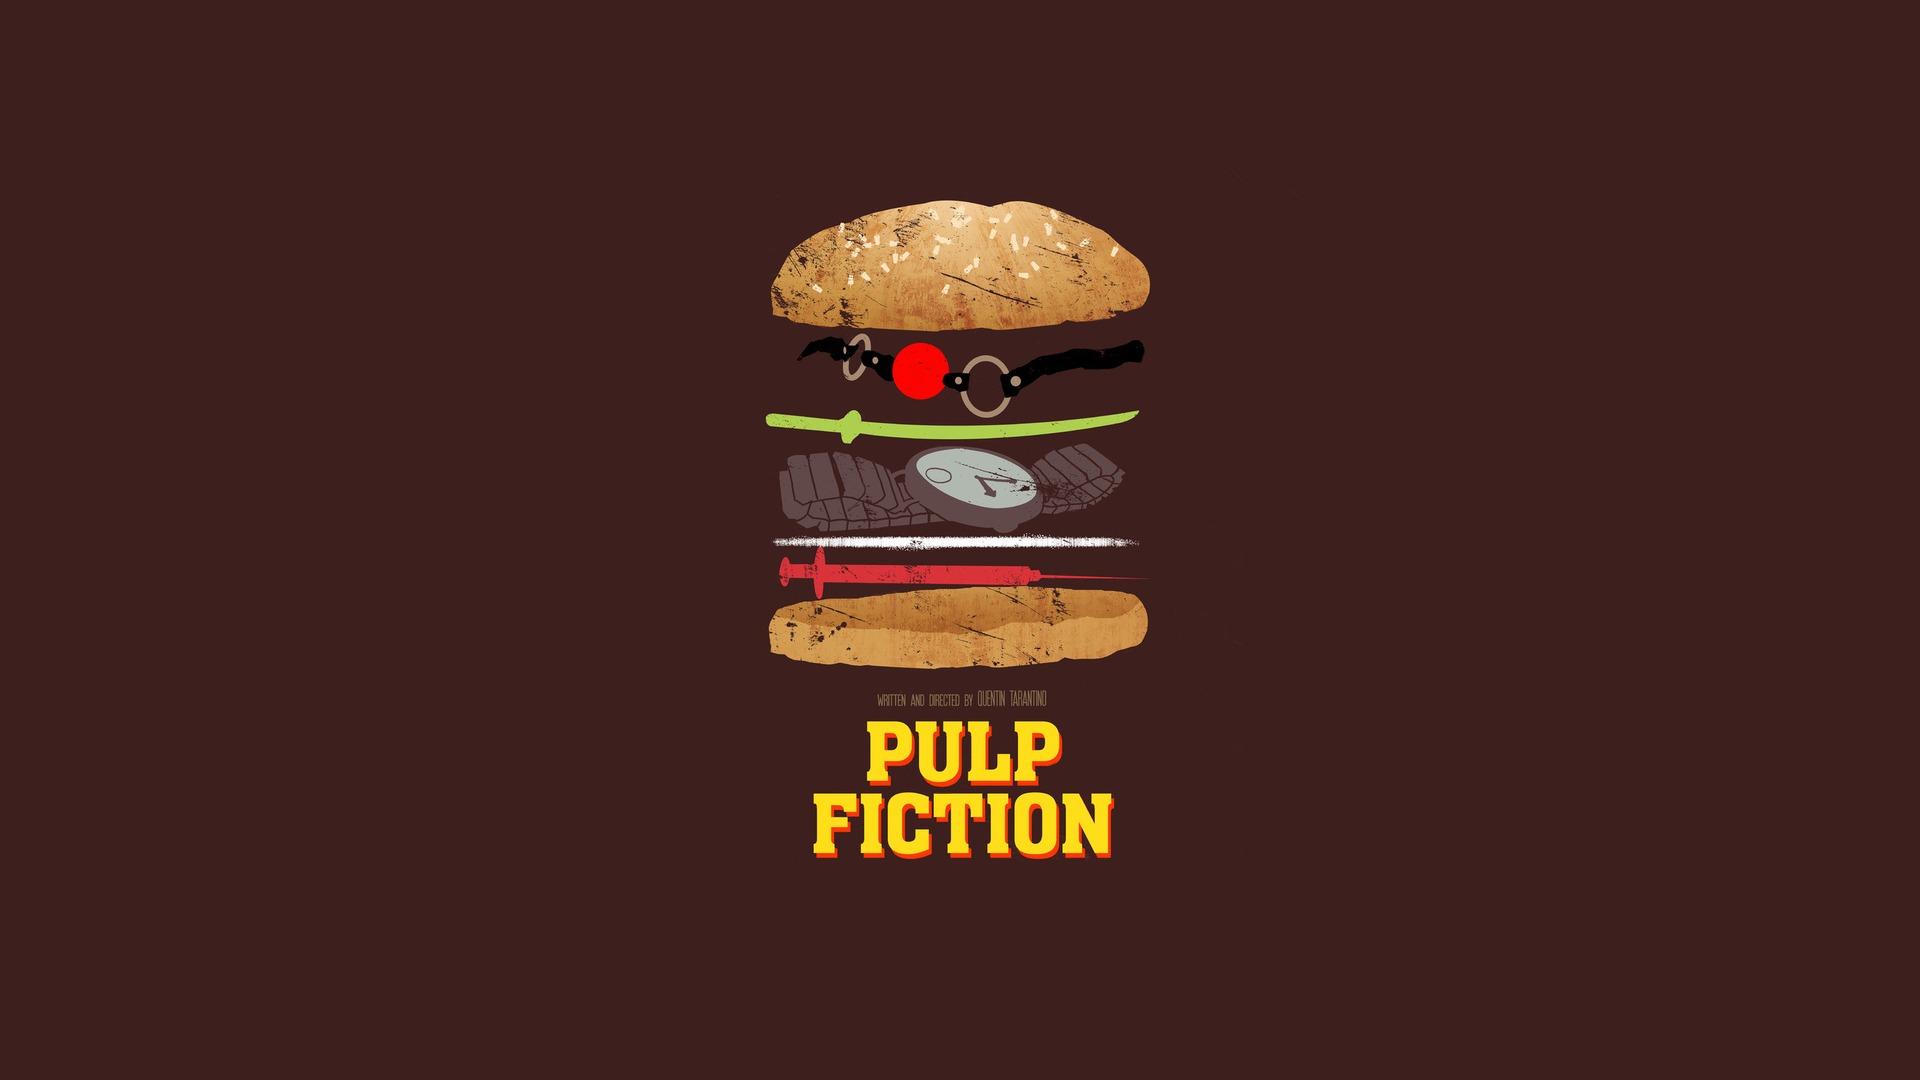 Pulp Fiction Backgrounds Wallpaper 1920x1080